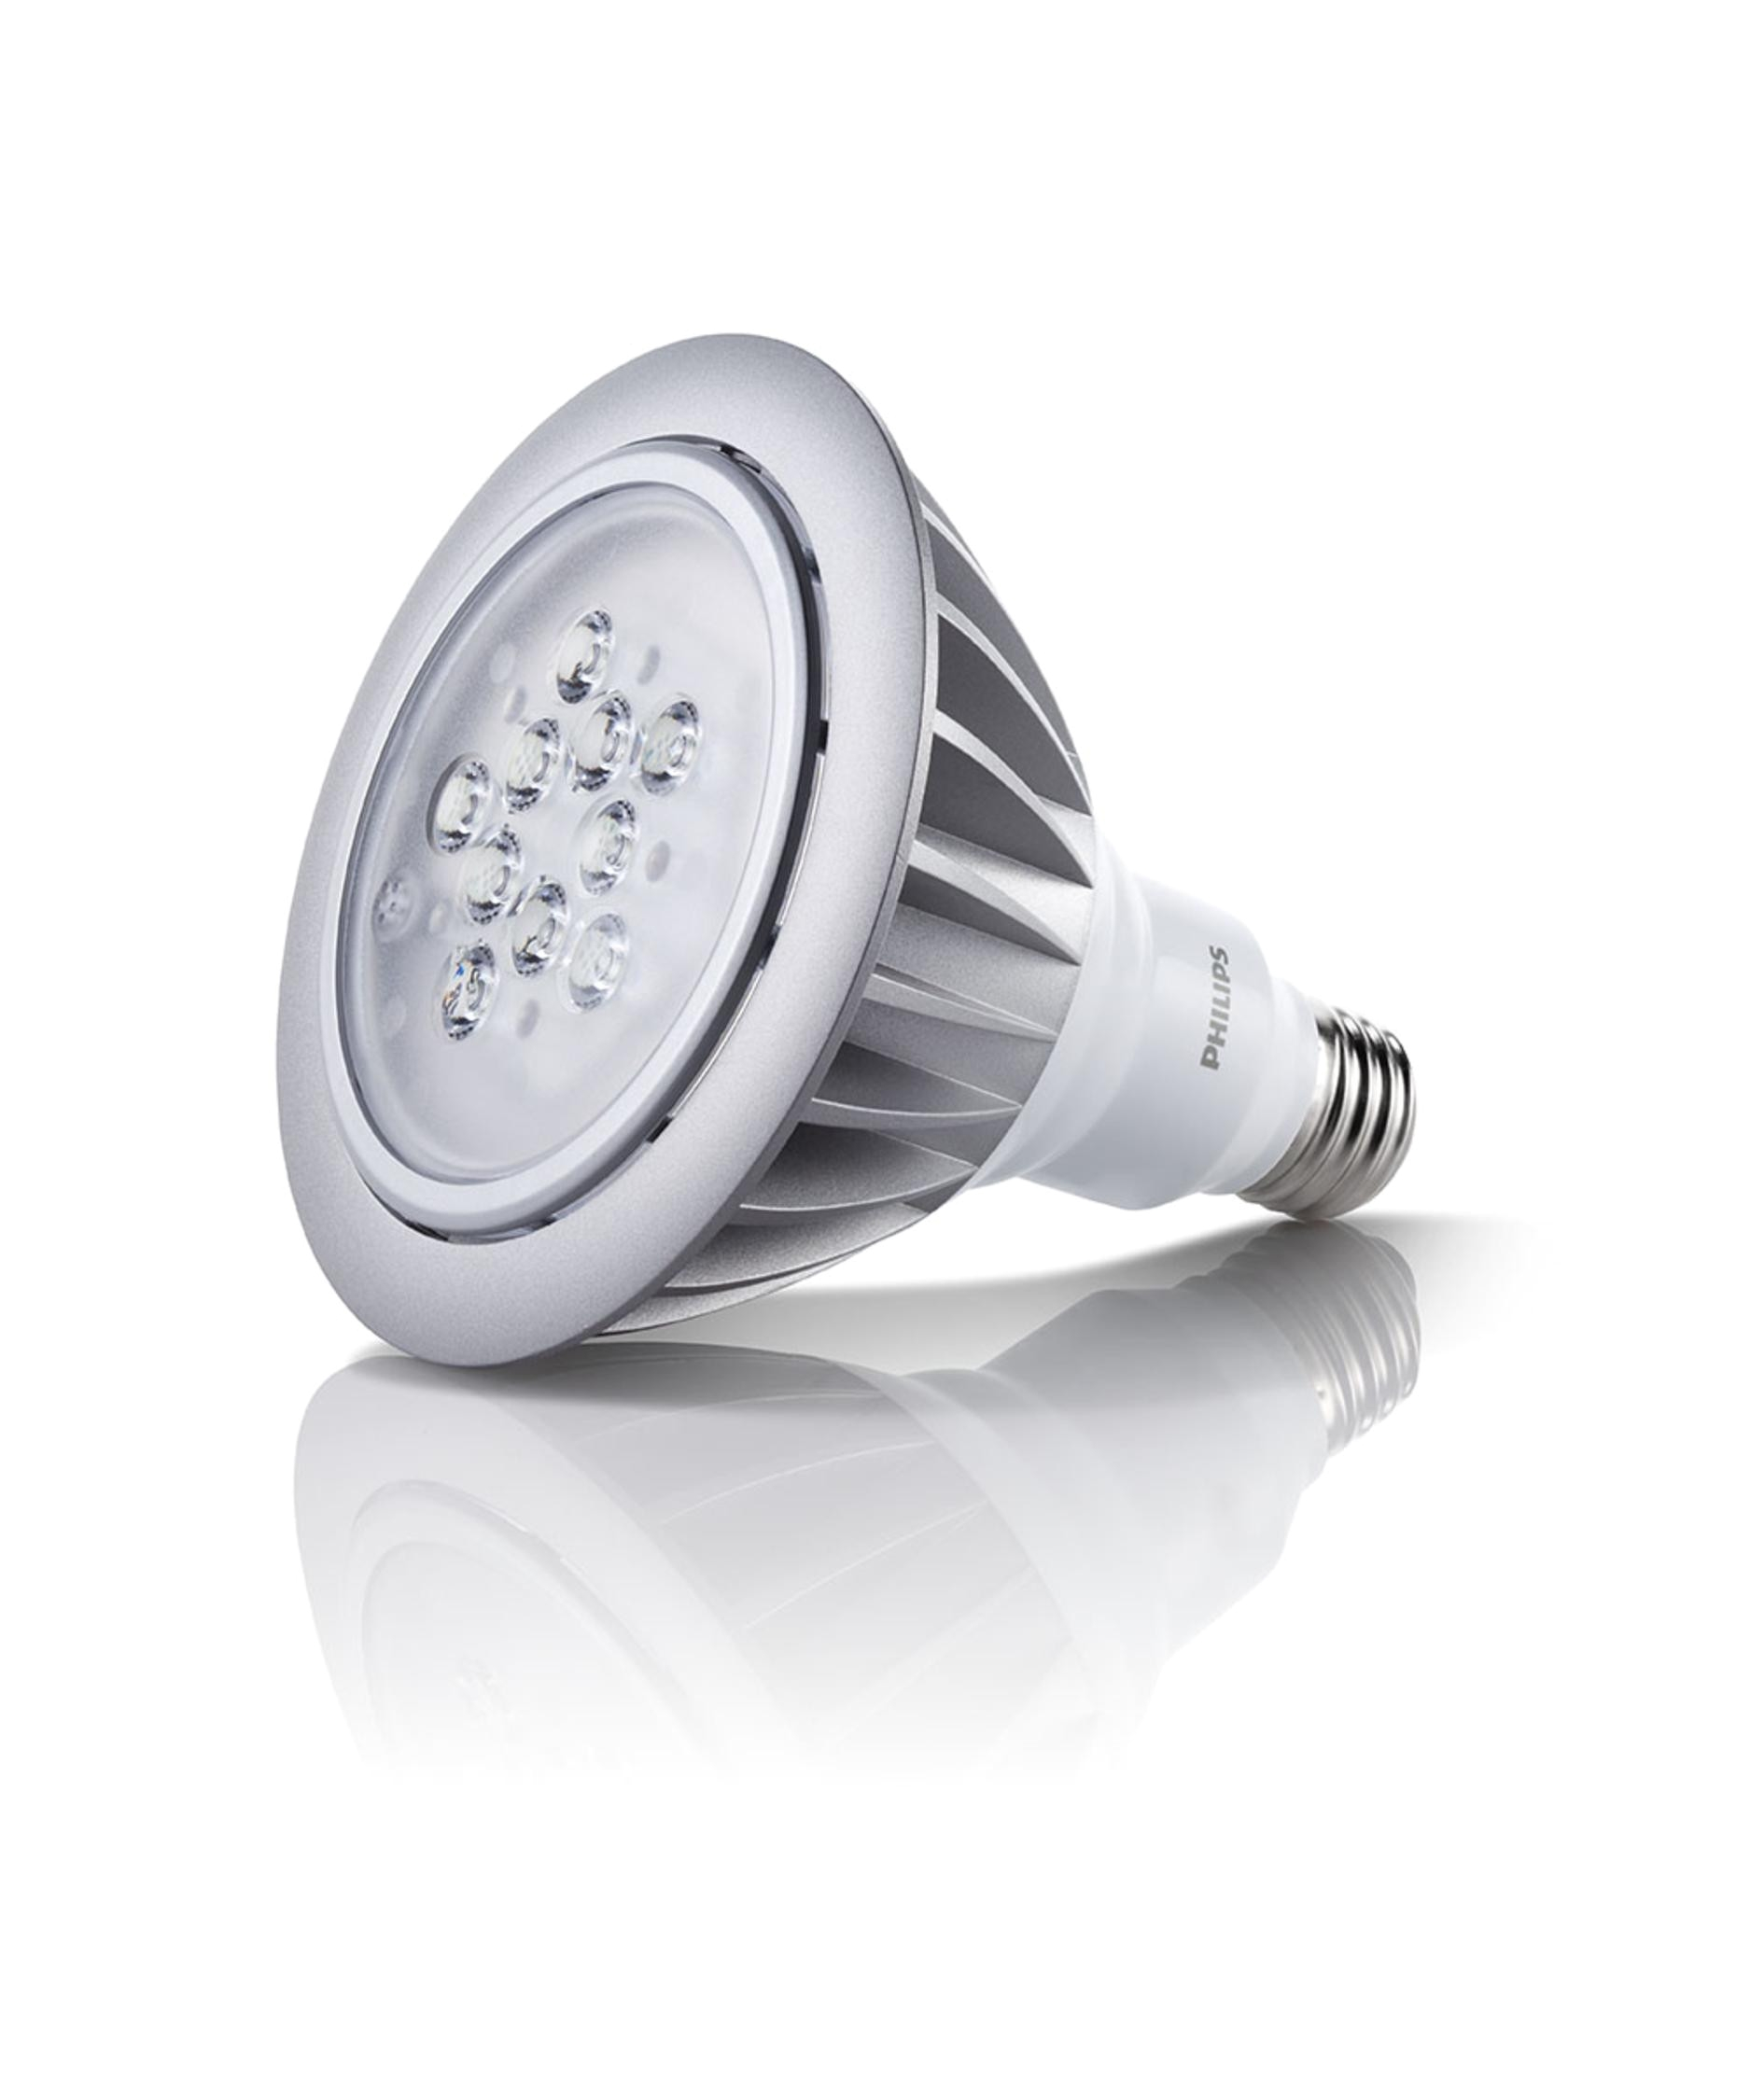 walmart outdoor lighting fixtures lovely lighting philips par38 led light bulb capitol par38 od led of